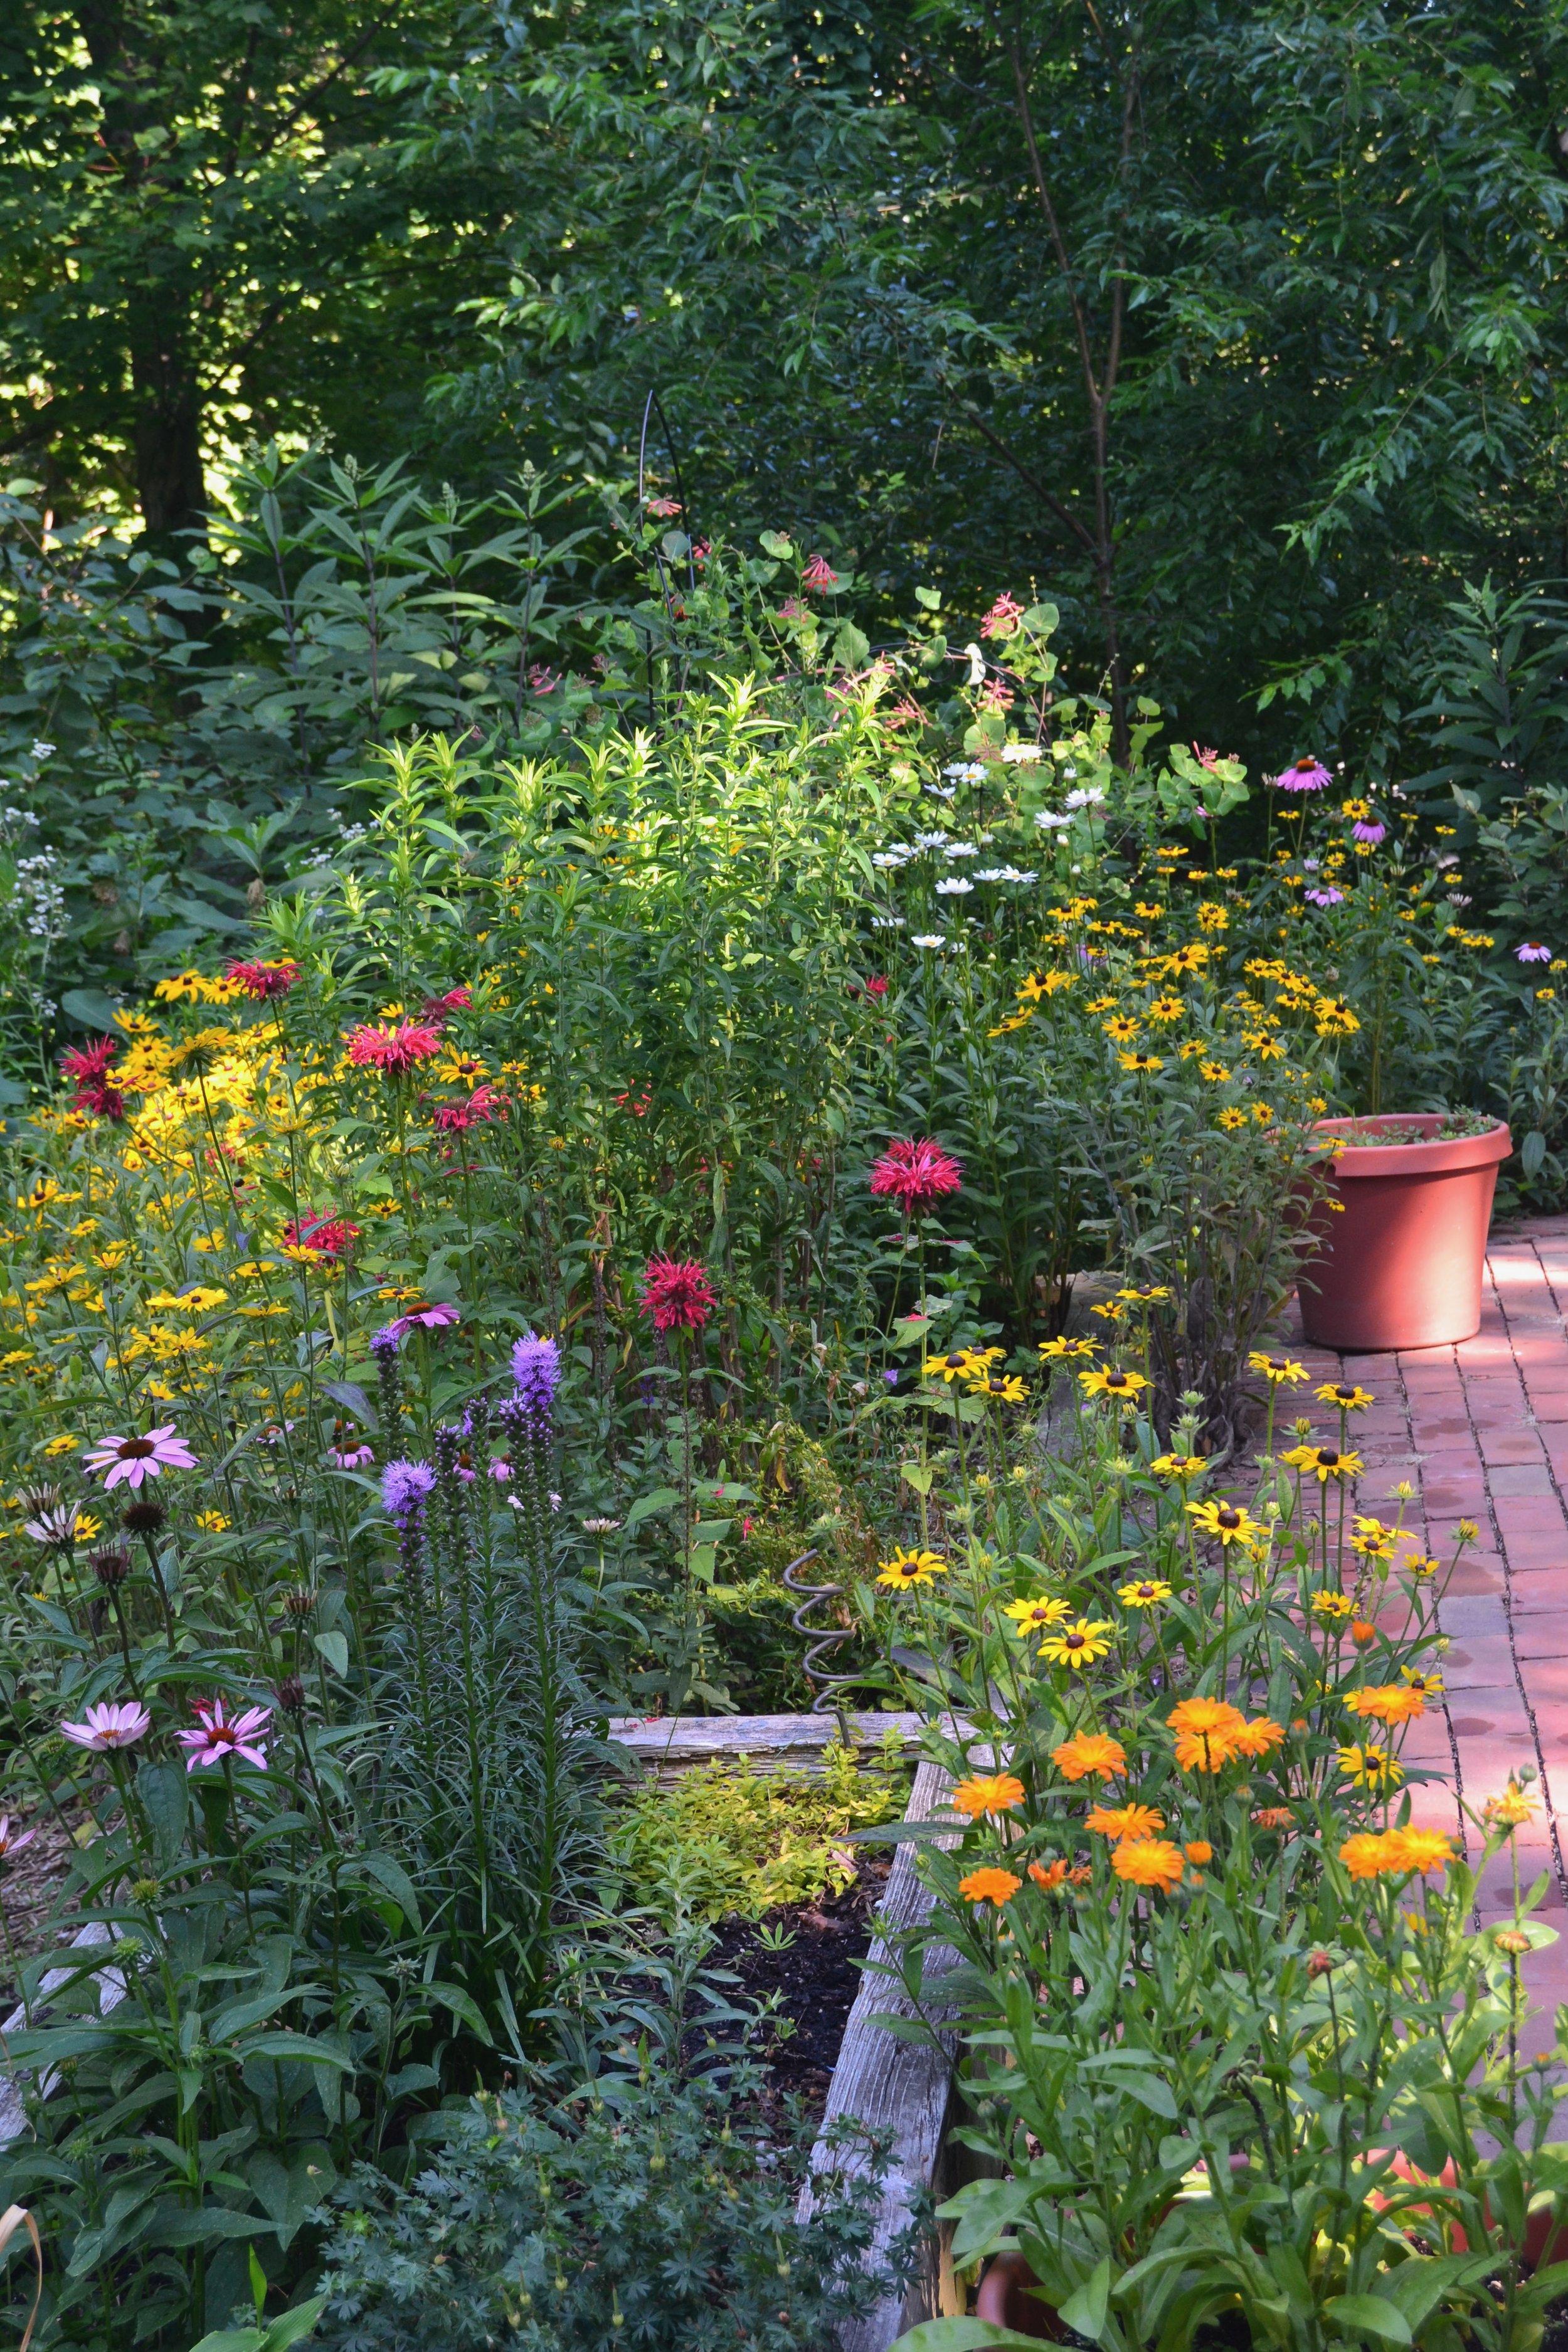 Perennial Border - A mixed border of native and ornamental perennials attracts pollinators and birds and provides all season interest.